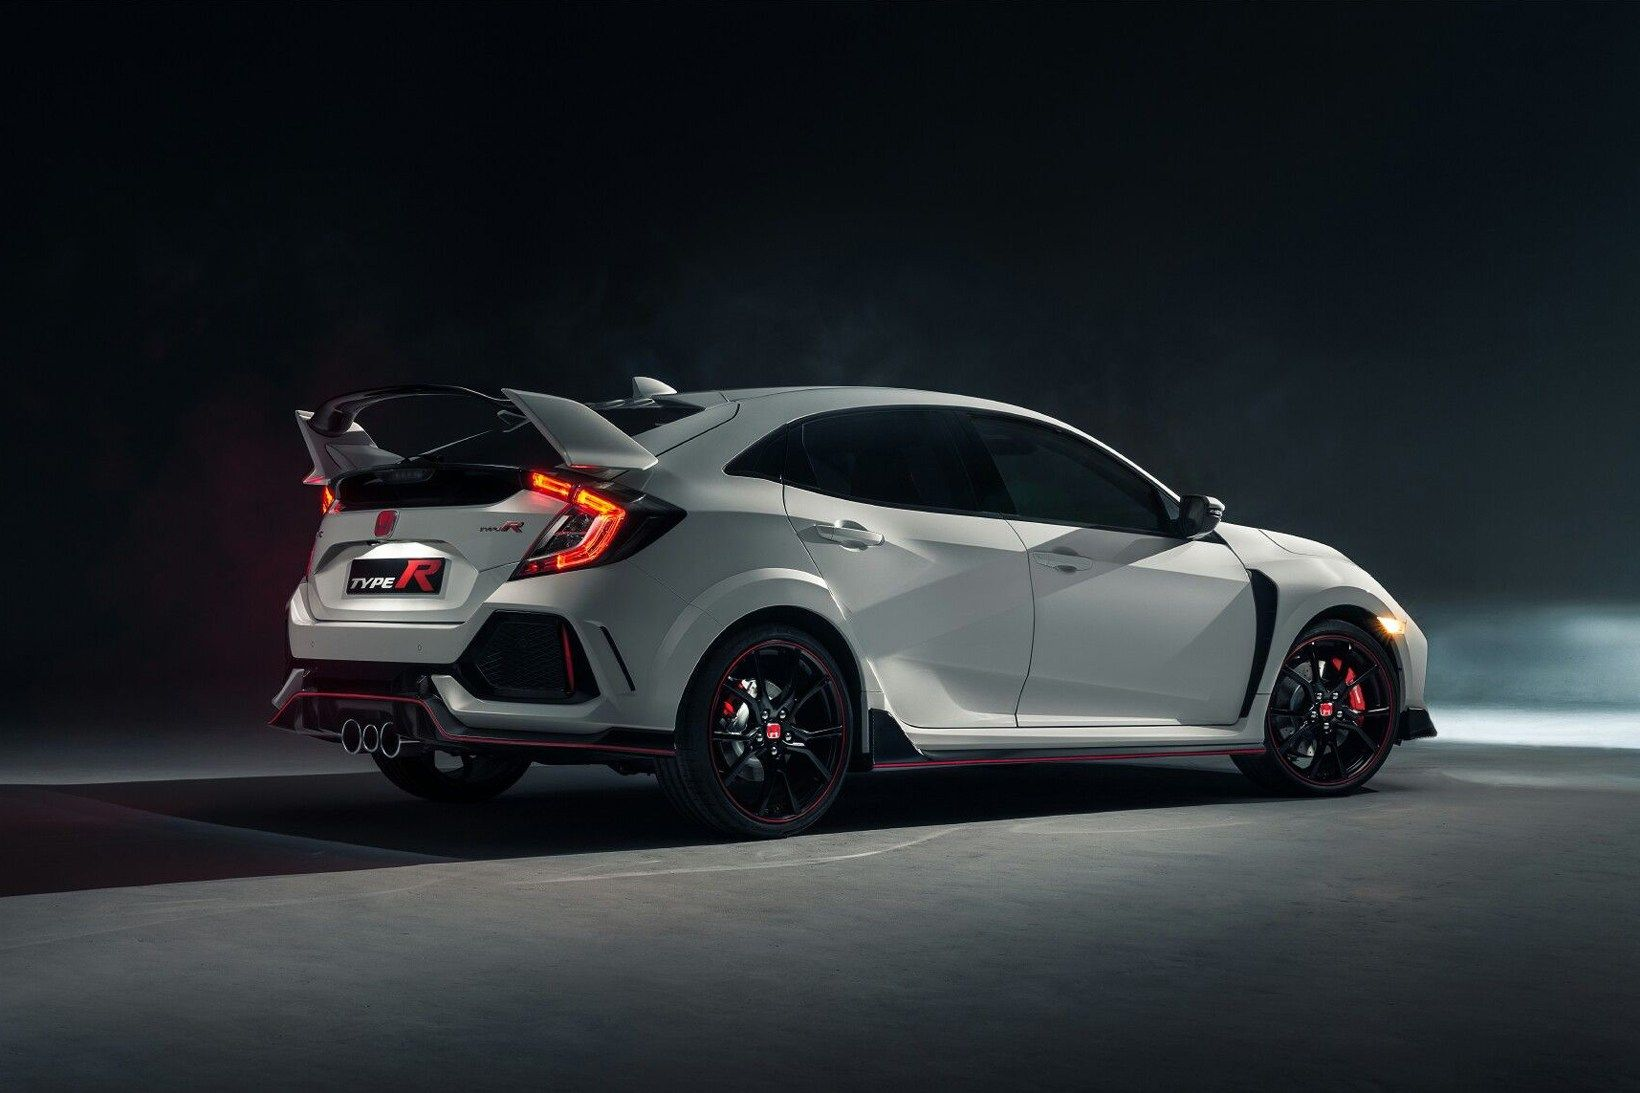 Honda Civic Type R Production Version Finally Unveiled In 2020 Honda Civic Type R Honda Civic Honda Type R